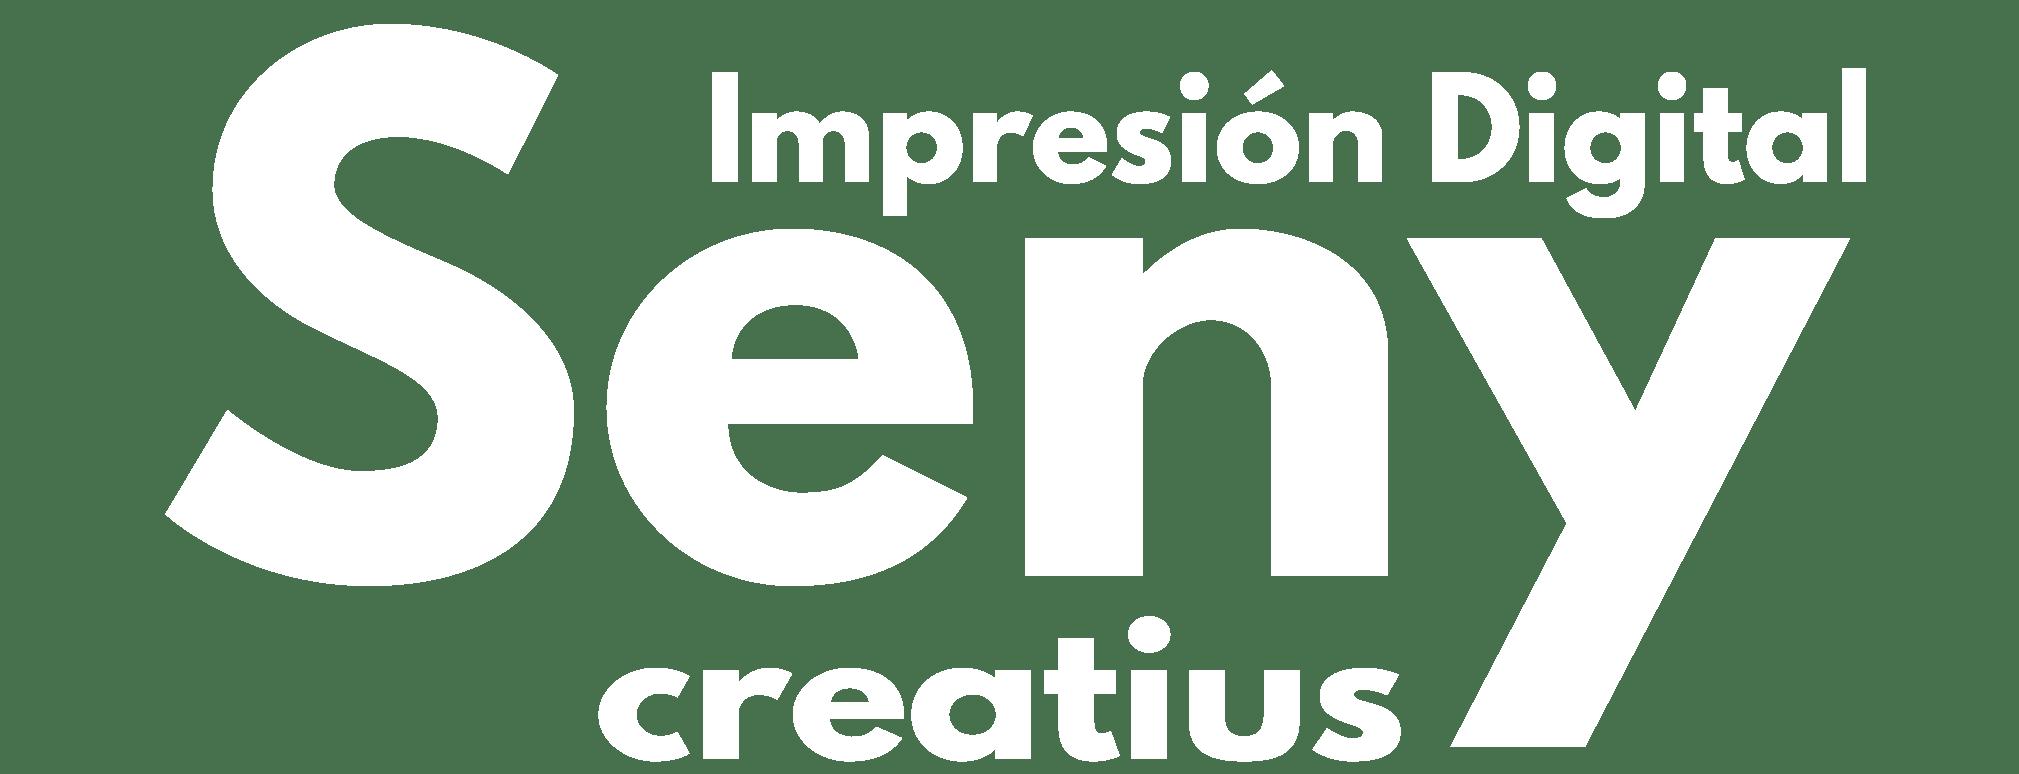 Seny Creatius